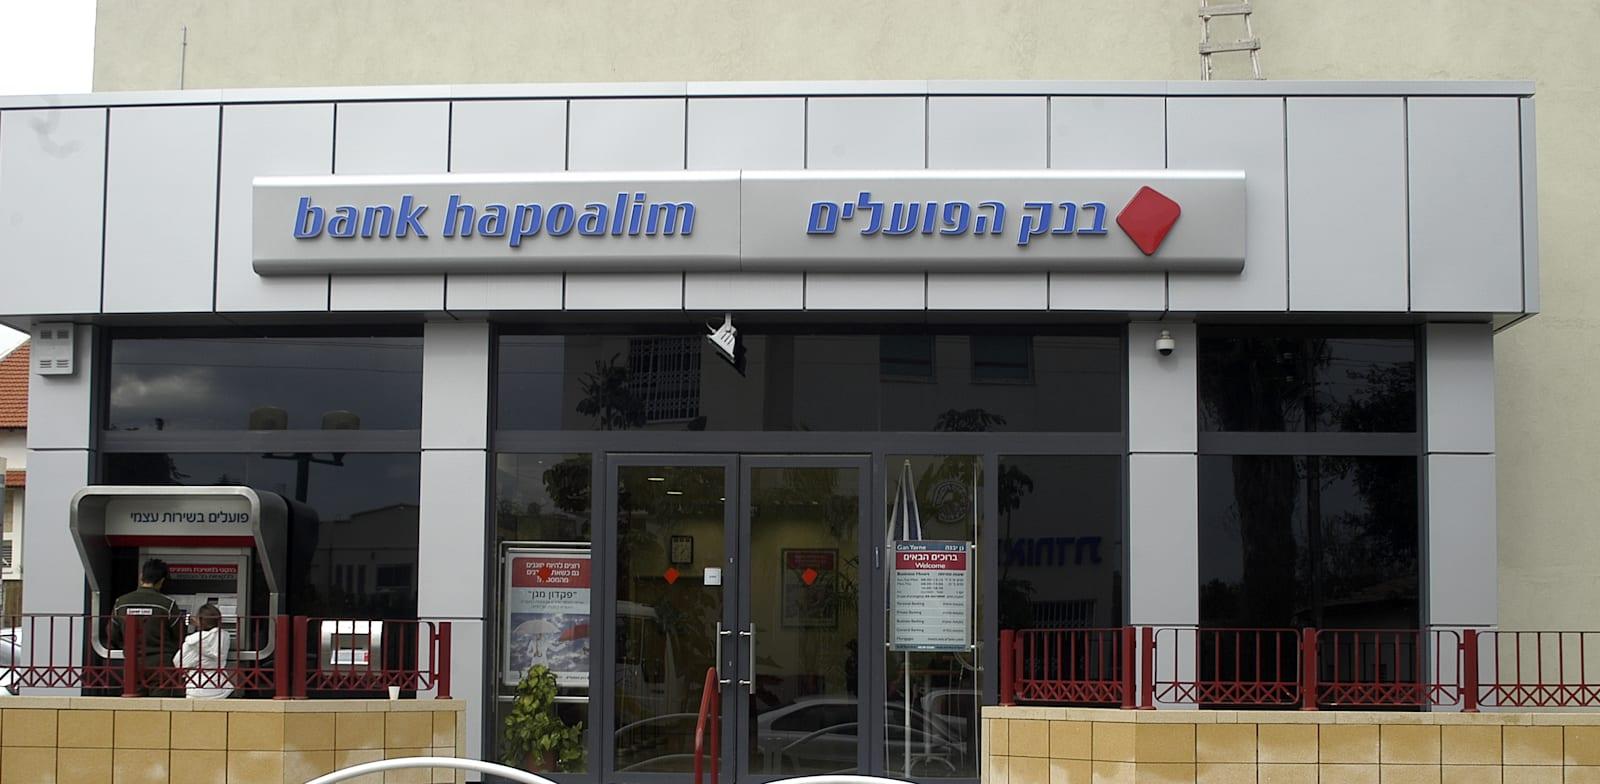 Bank Hapoalim Photo: Eyal Fisher